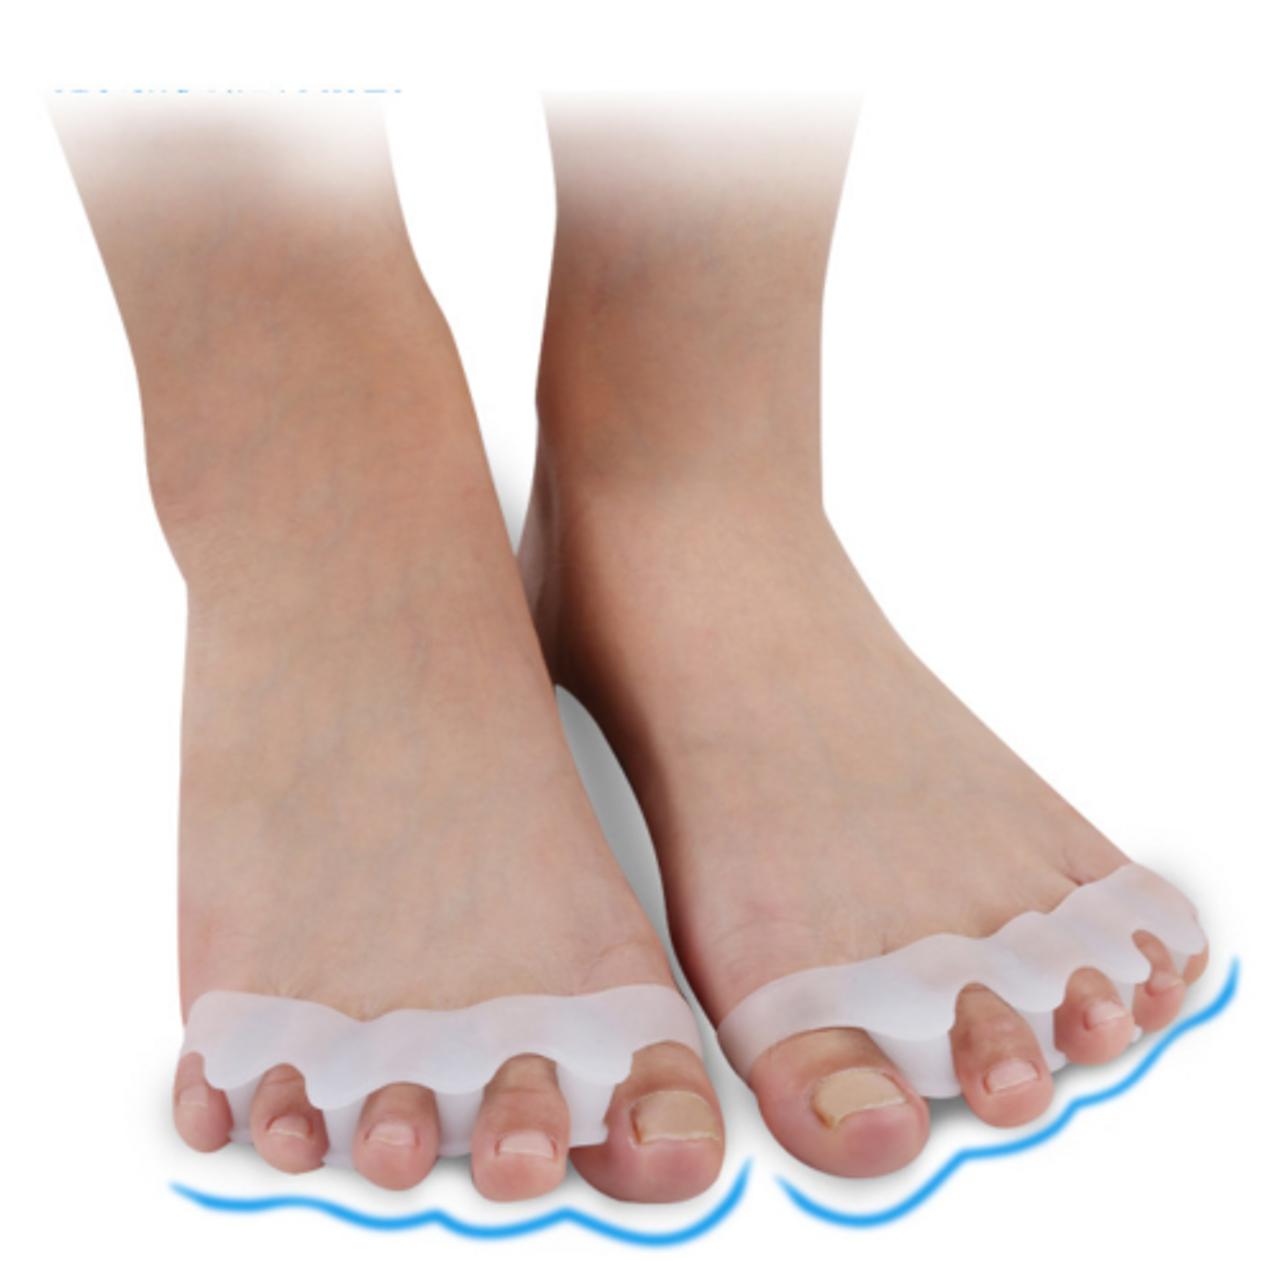 2PC Bunion Corrector Silicone Toe Separator Straightener Orthopedic Toes Spacer